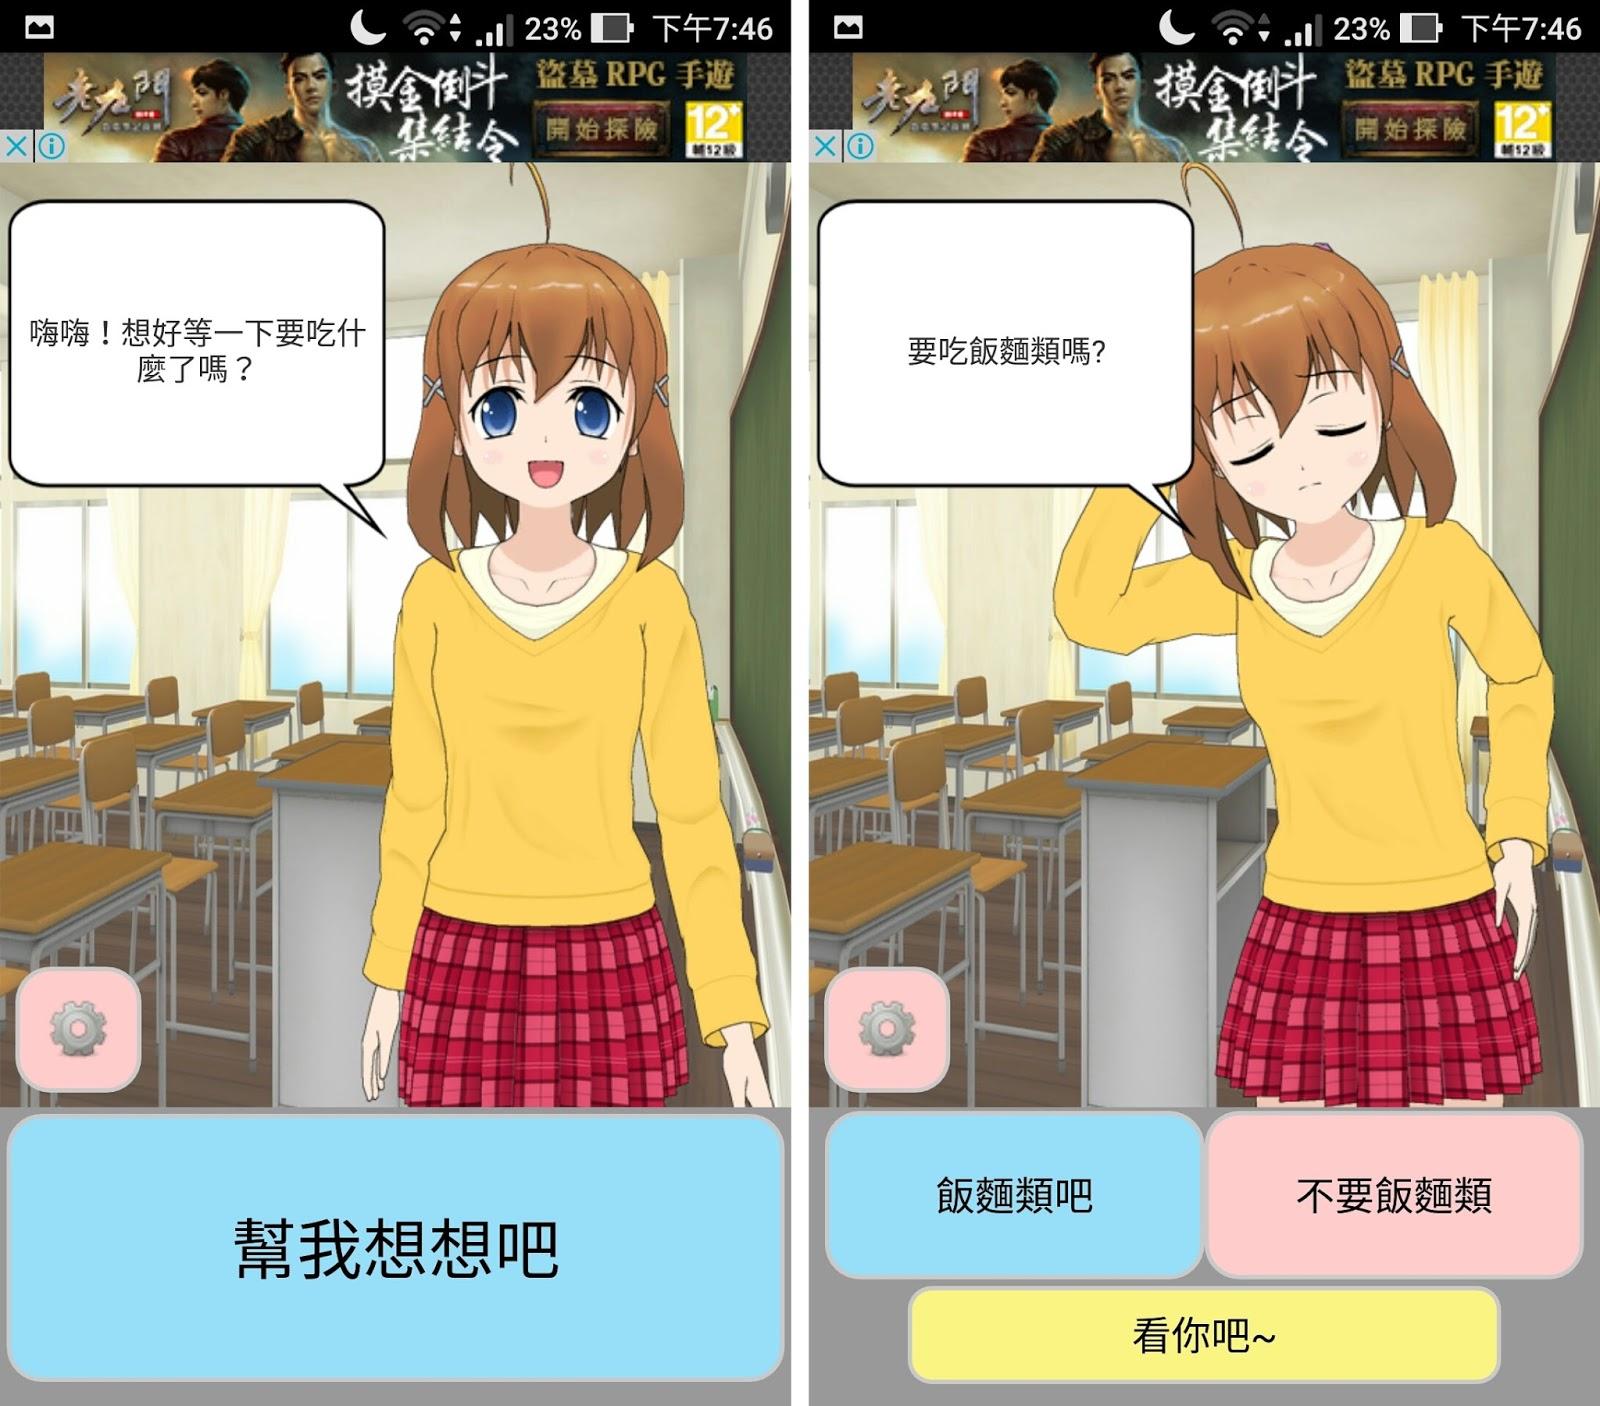 Screenshot 20170422 194643 - 「等下吃什麼?」總是猶豫不決,就讓虛擬女友幫你決定!